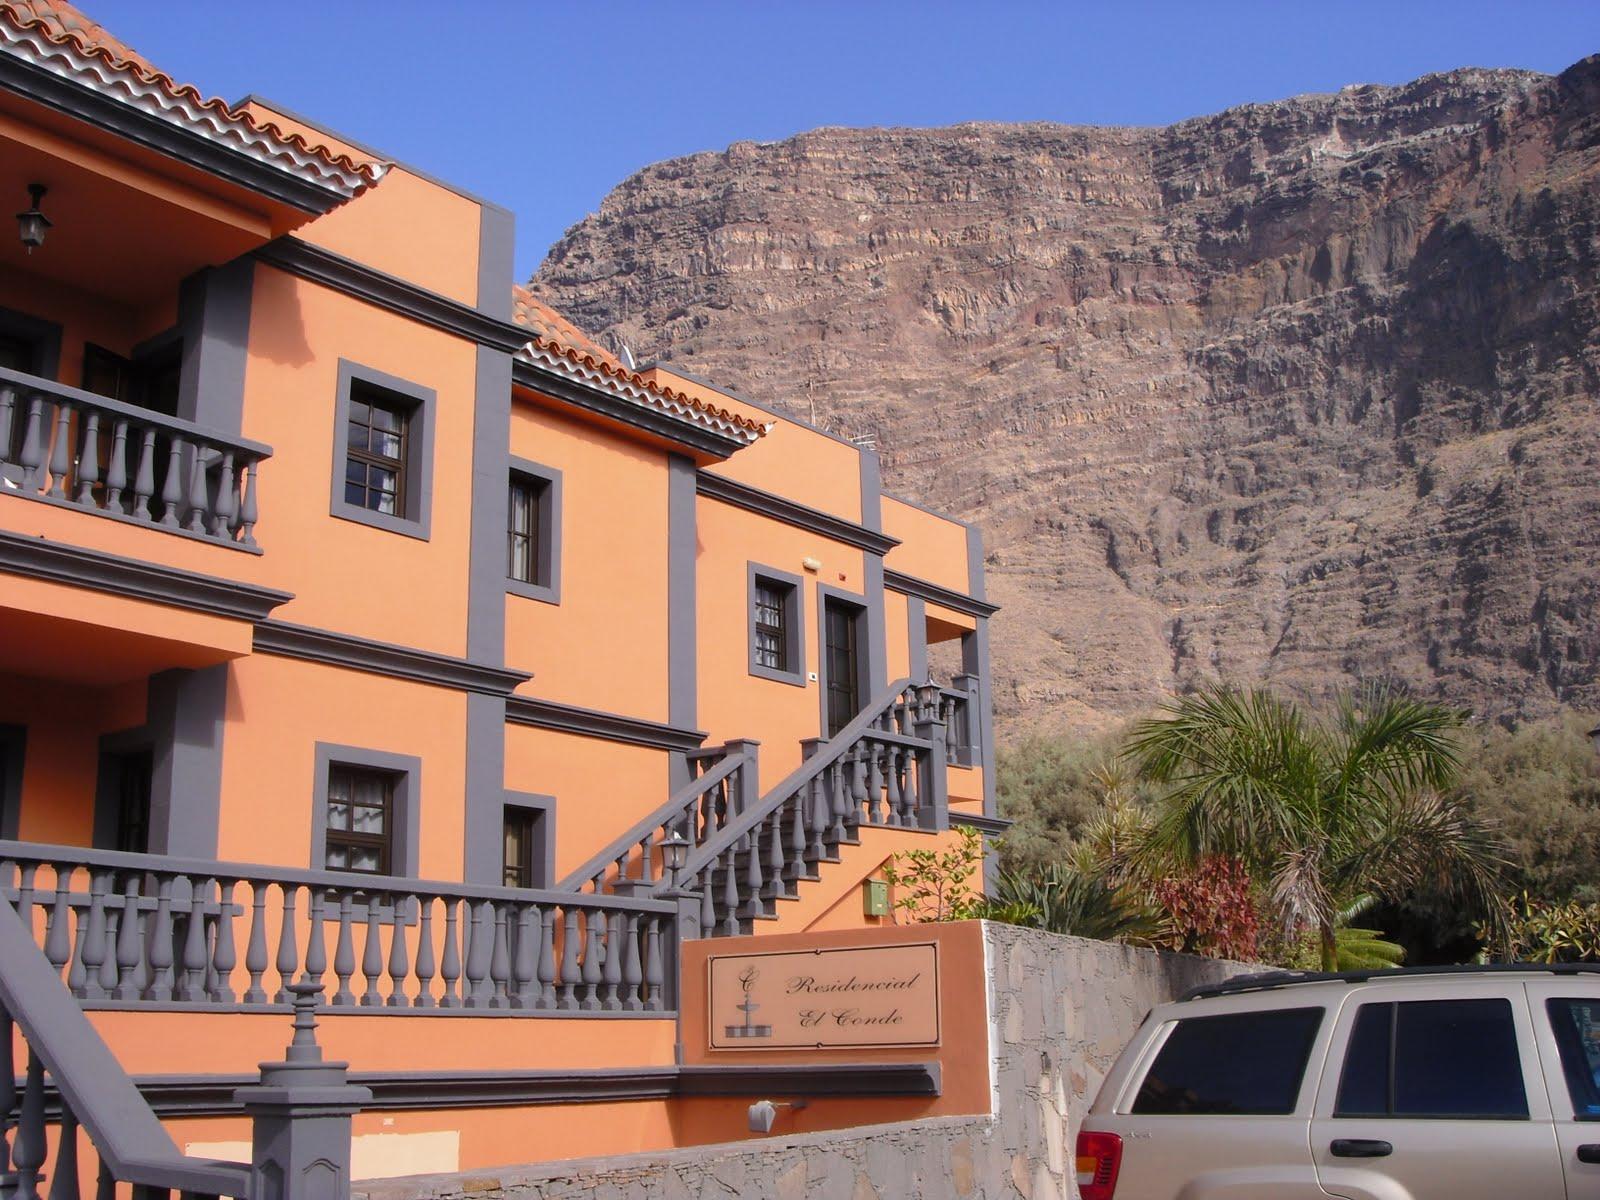 Residencial El Conde (Резиденция Эль-Конде)